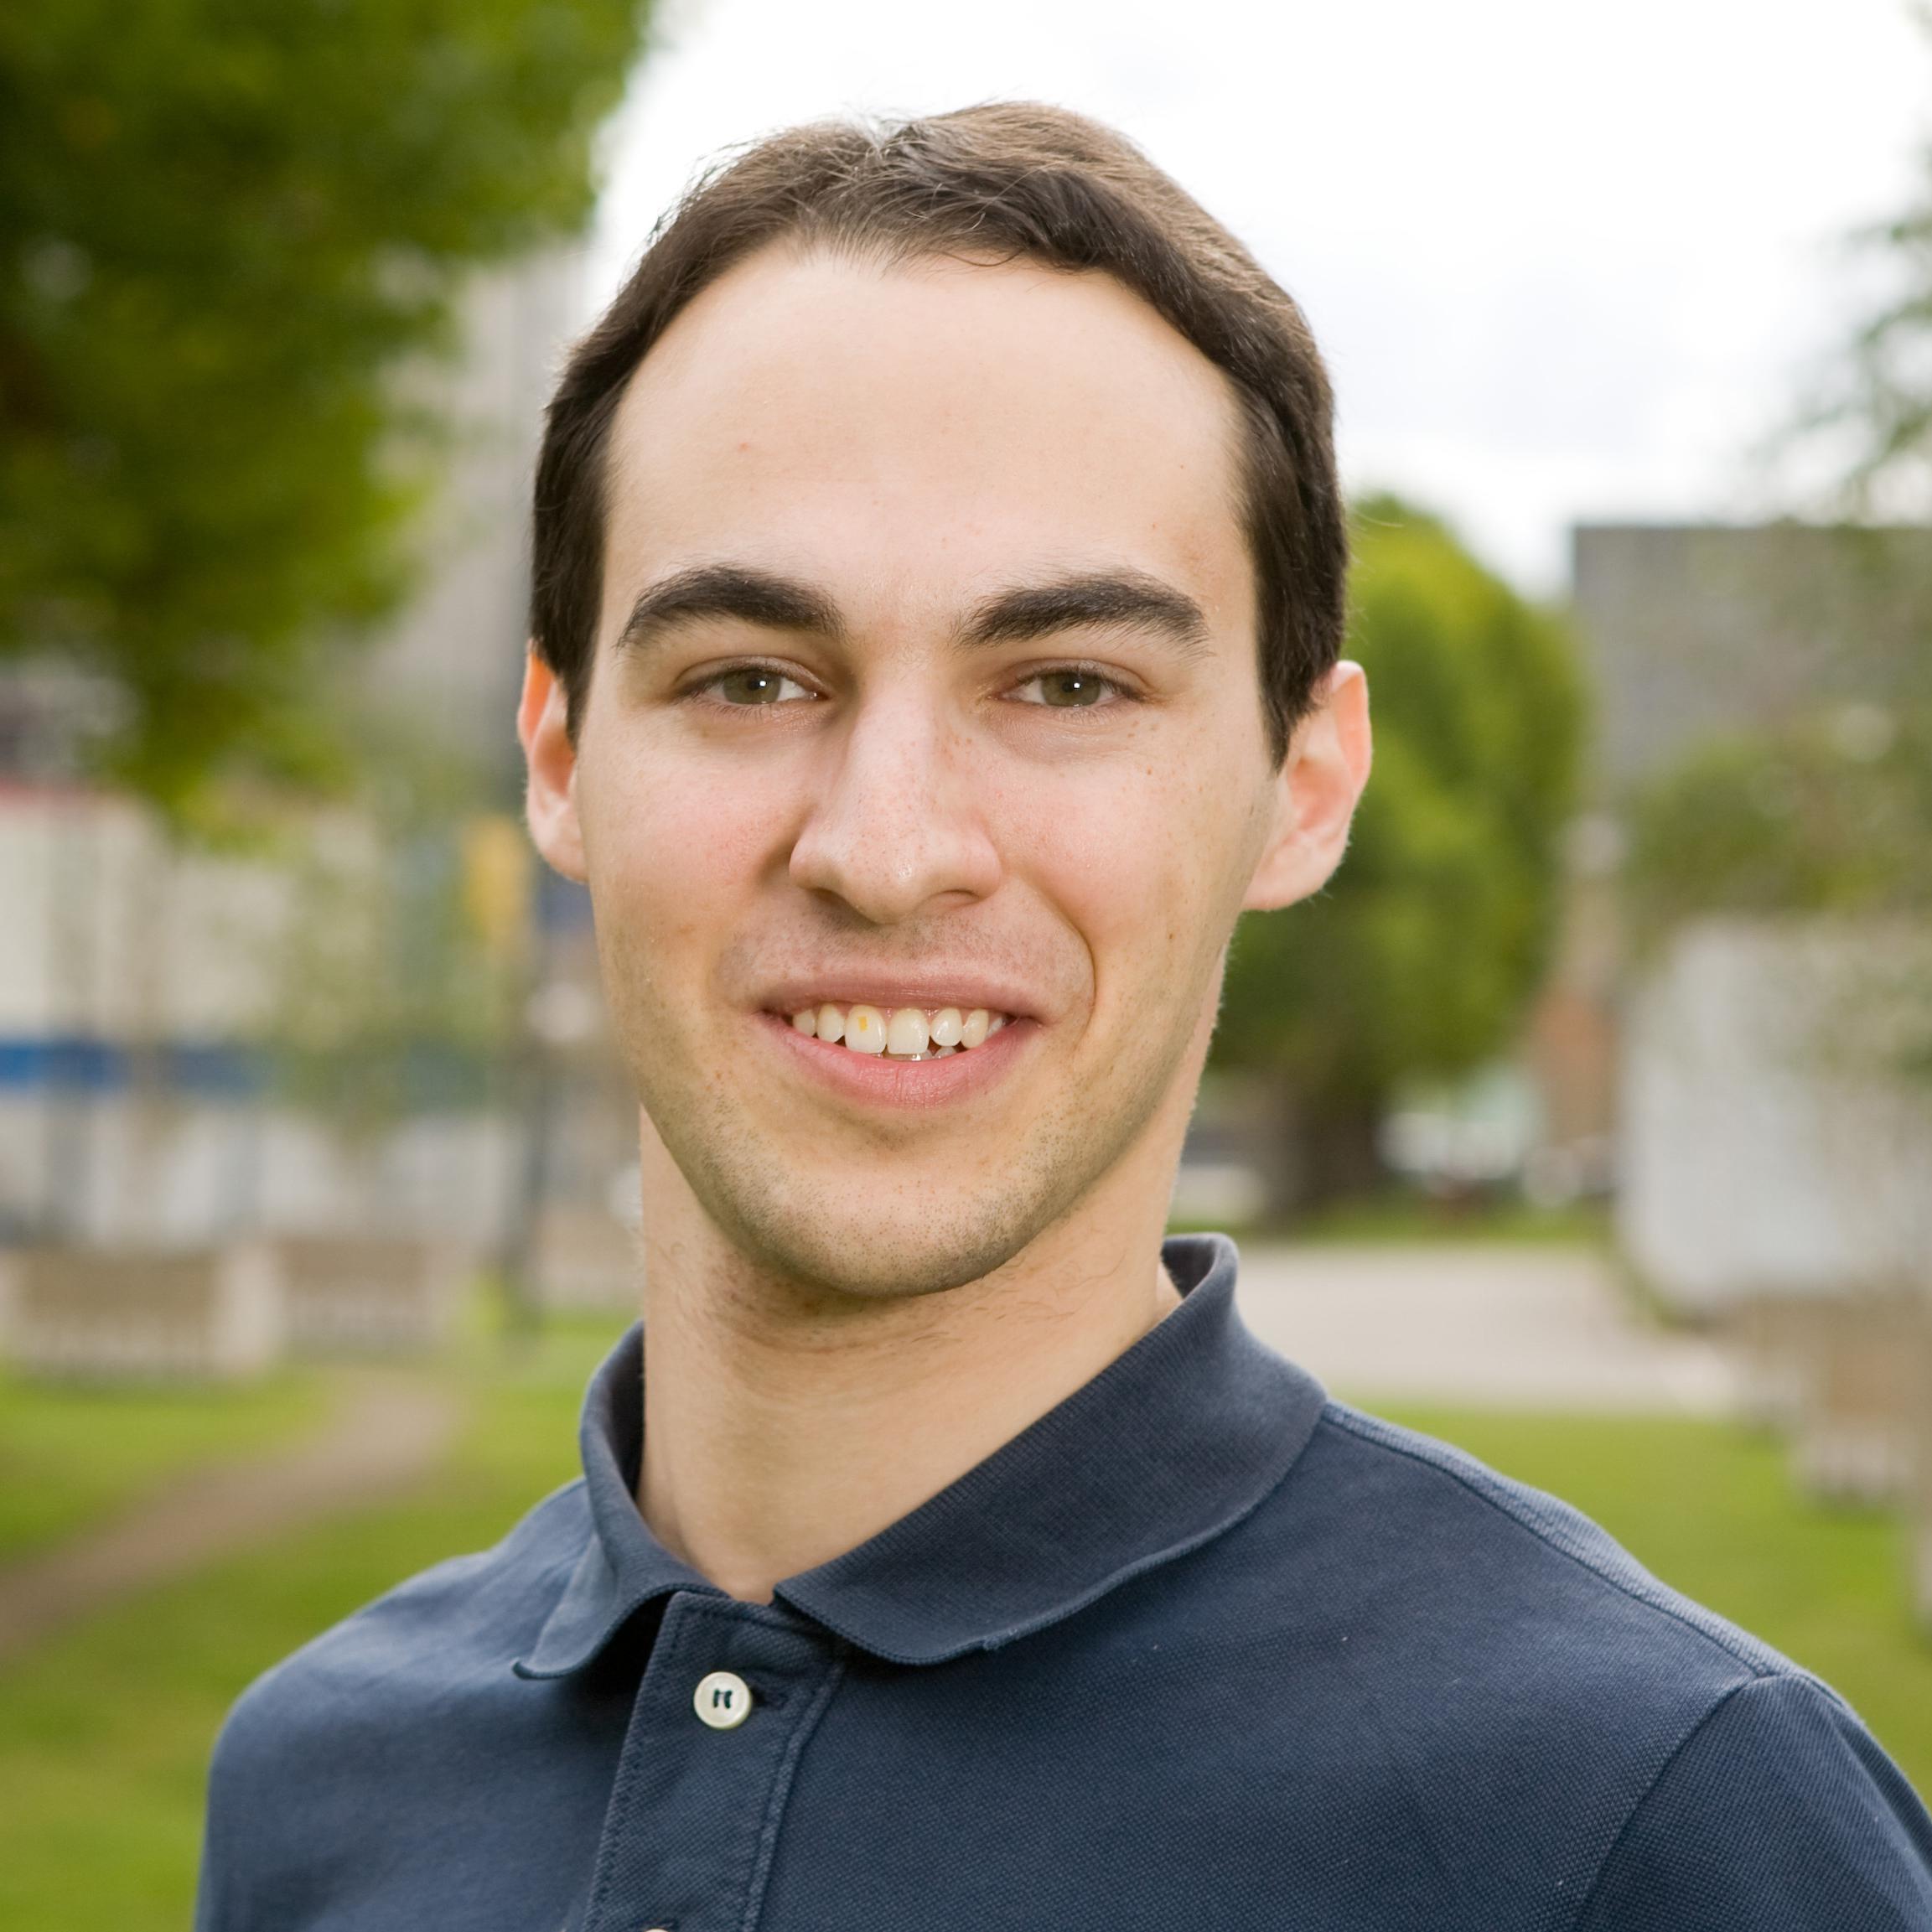 Assistant Prof. Dr. Enrico Glaab